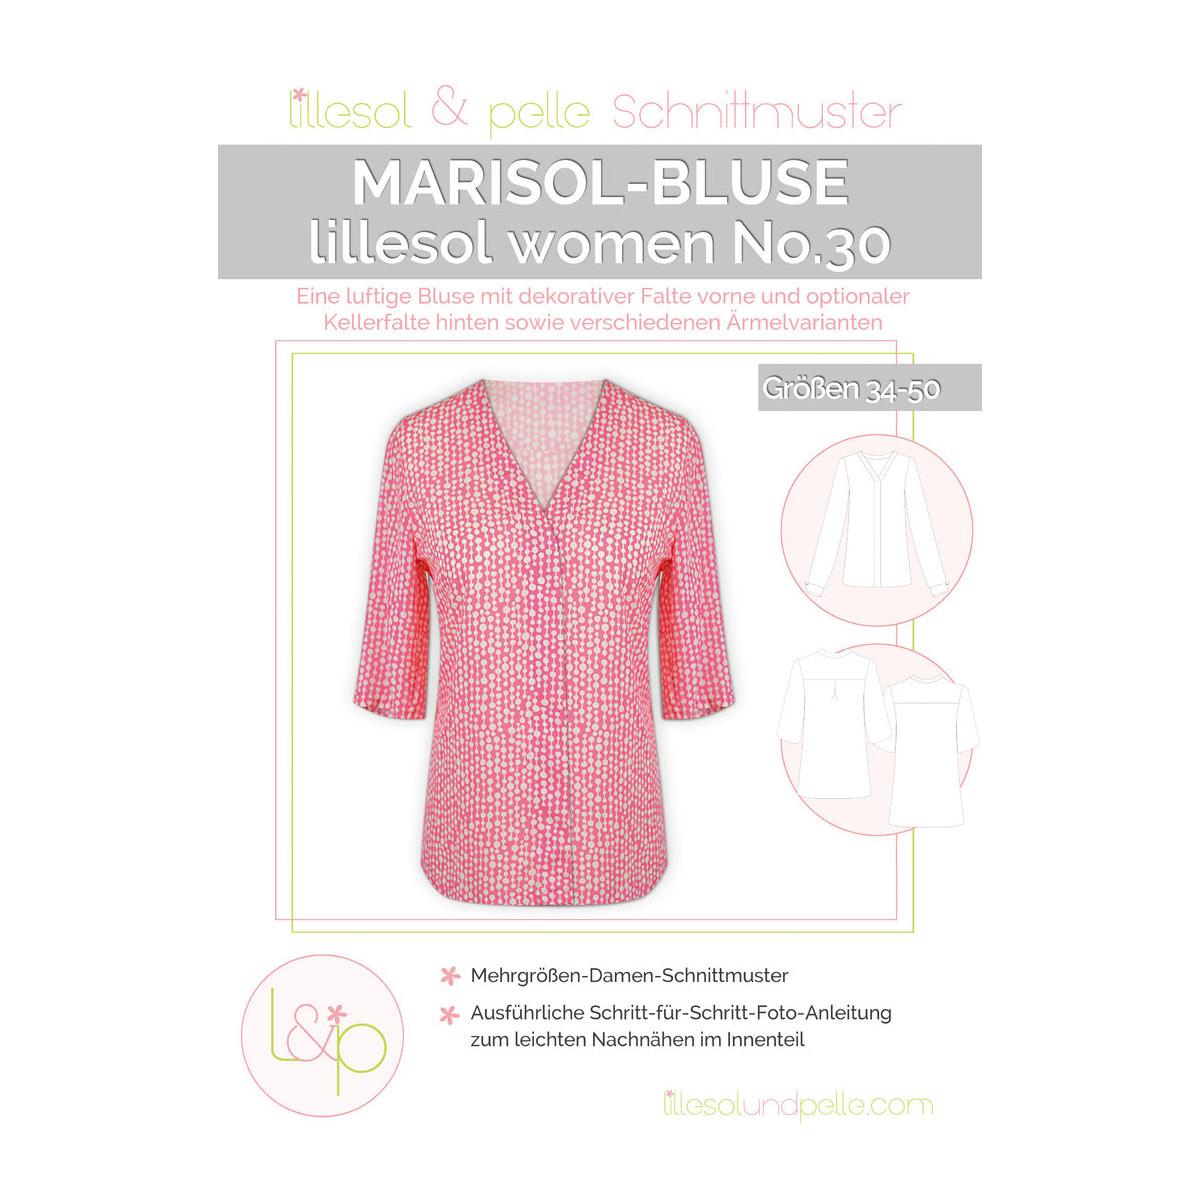 LILLESOL Women Papierschnittmuster No.30 Marisol-Bluse